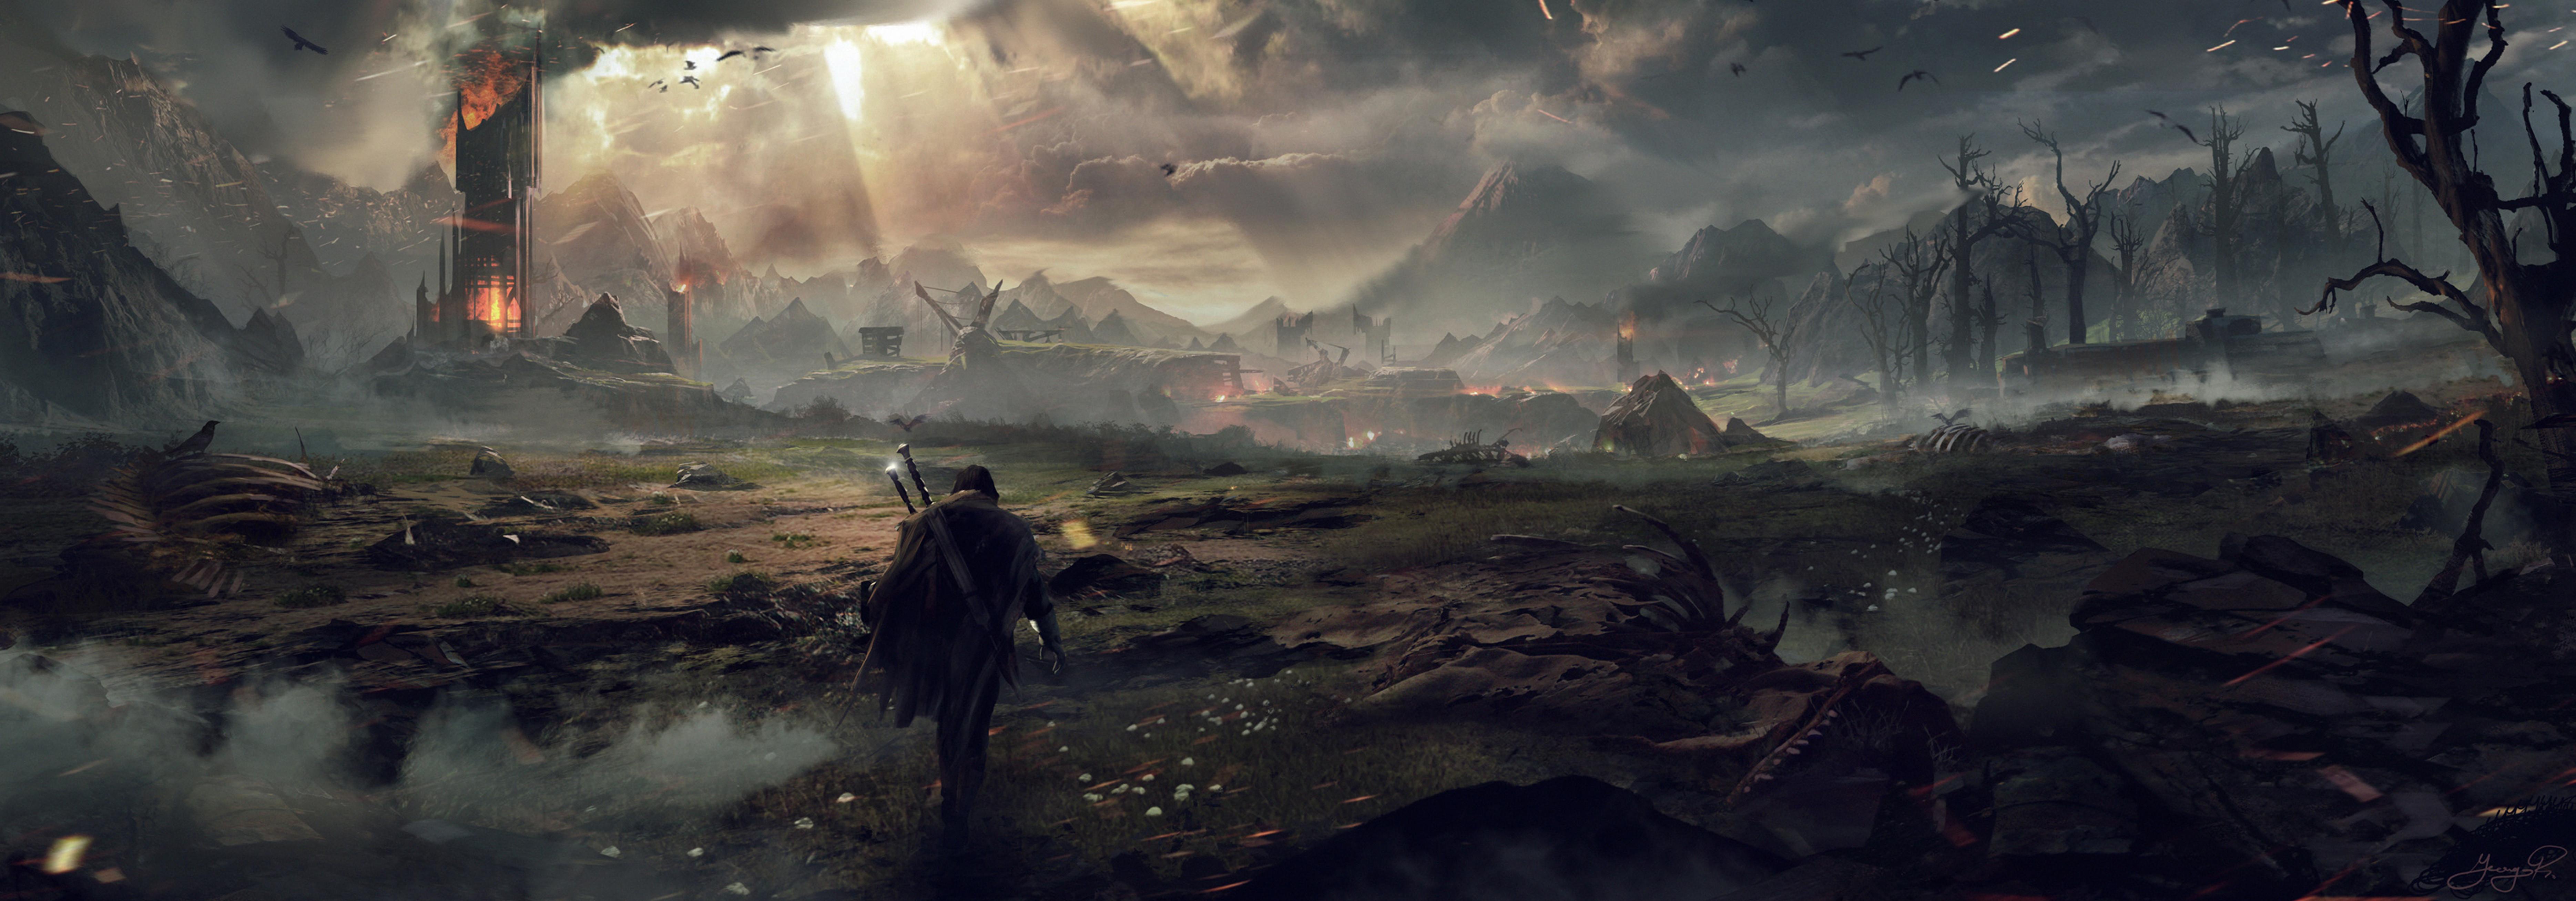 Video Game Concept Art Wallpaper